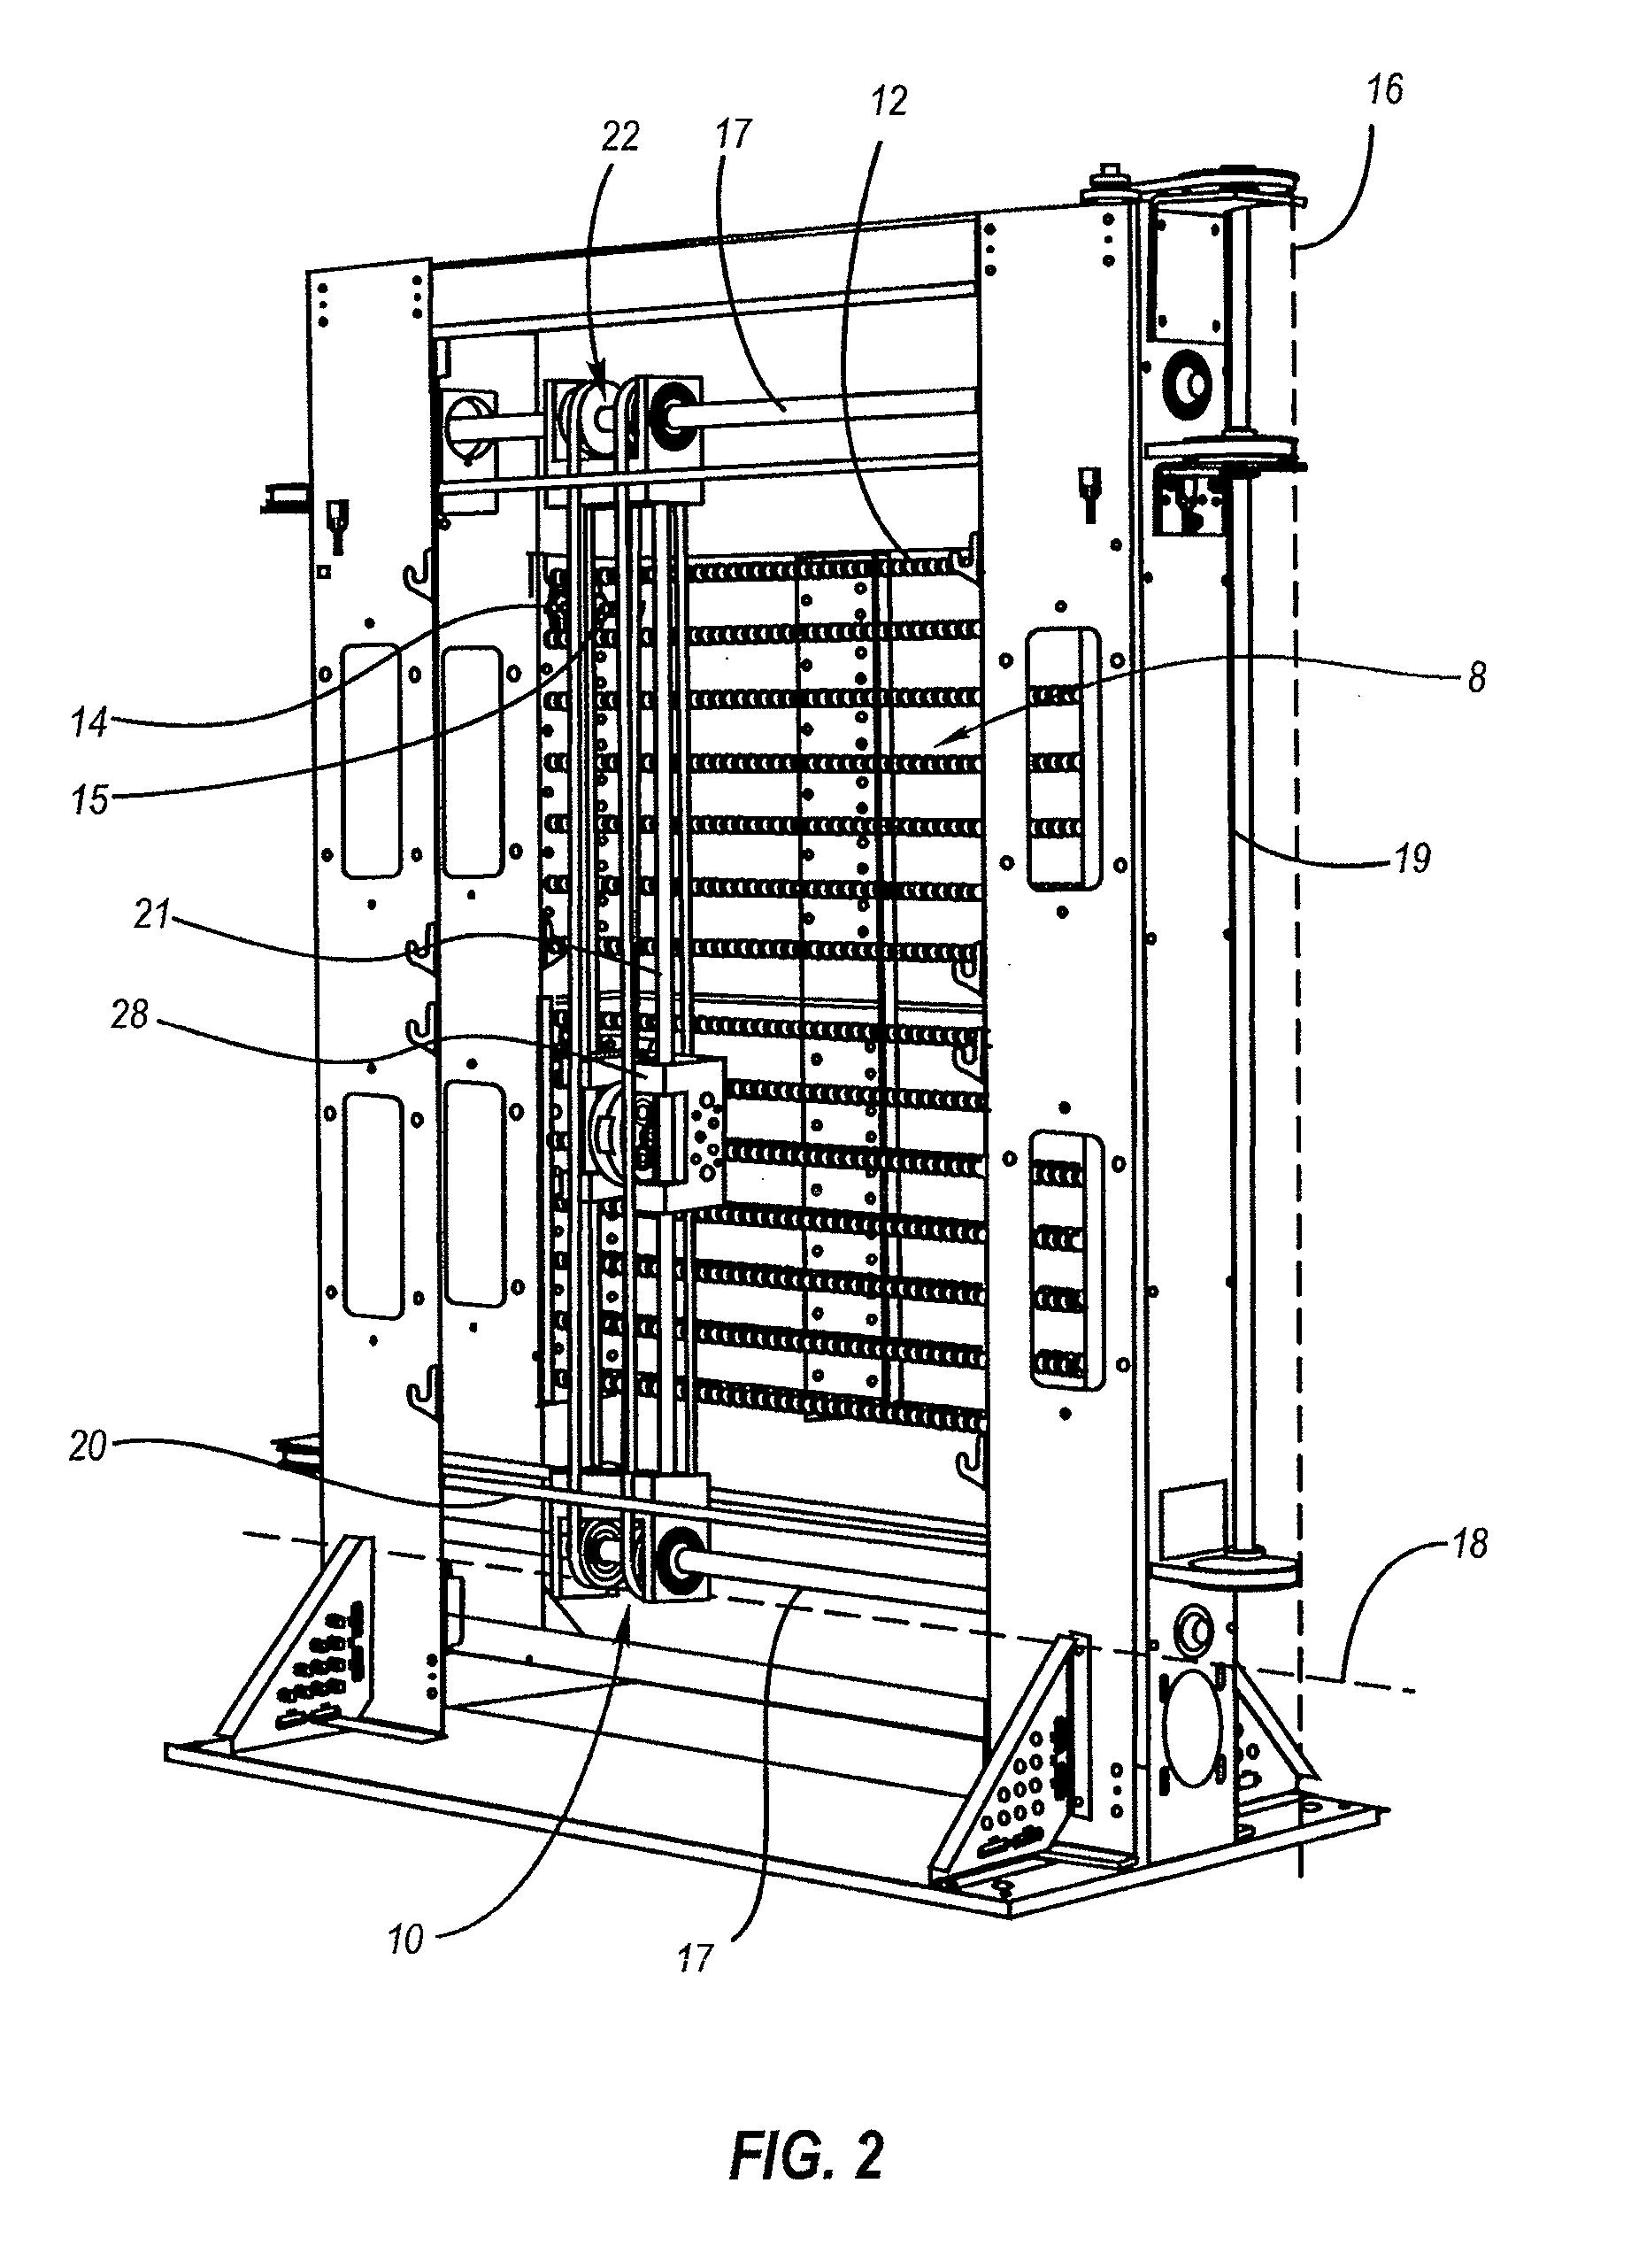 Patent US 9,895,752 B2